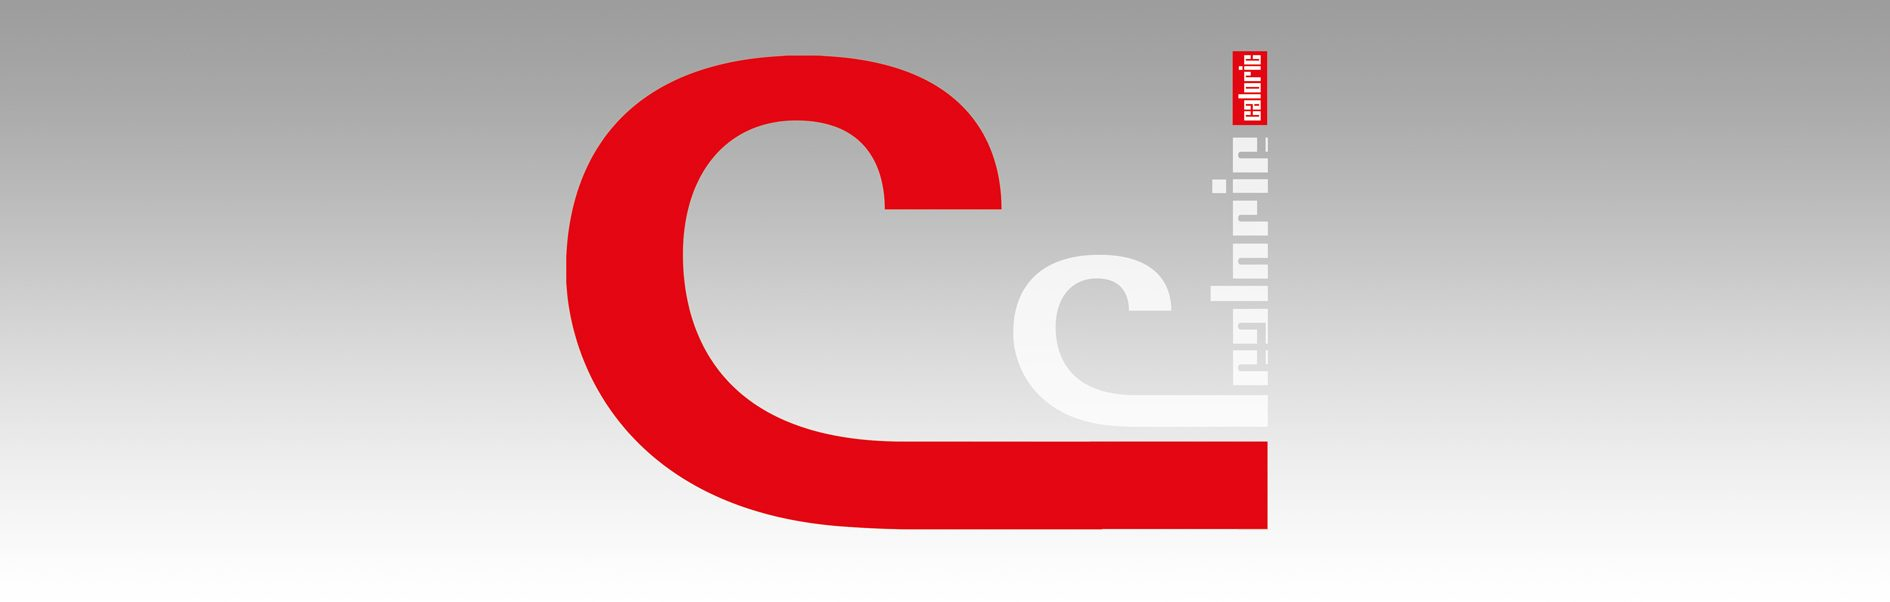 Hier ist das Key Visual unseres Kunden Caloric abgebildet.